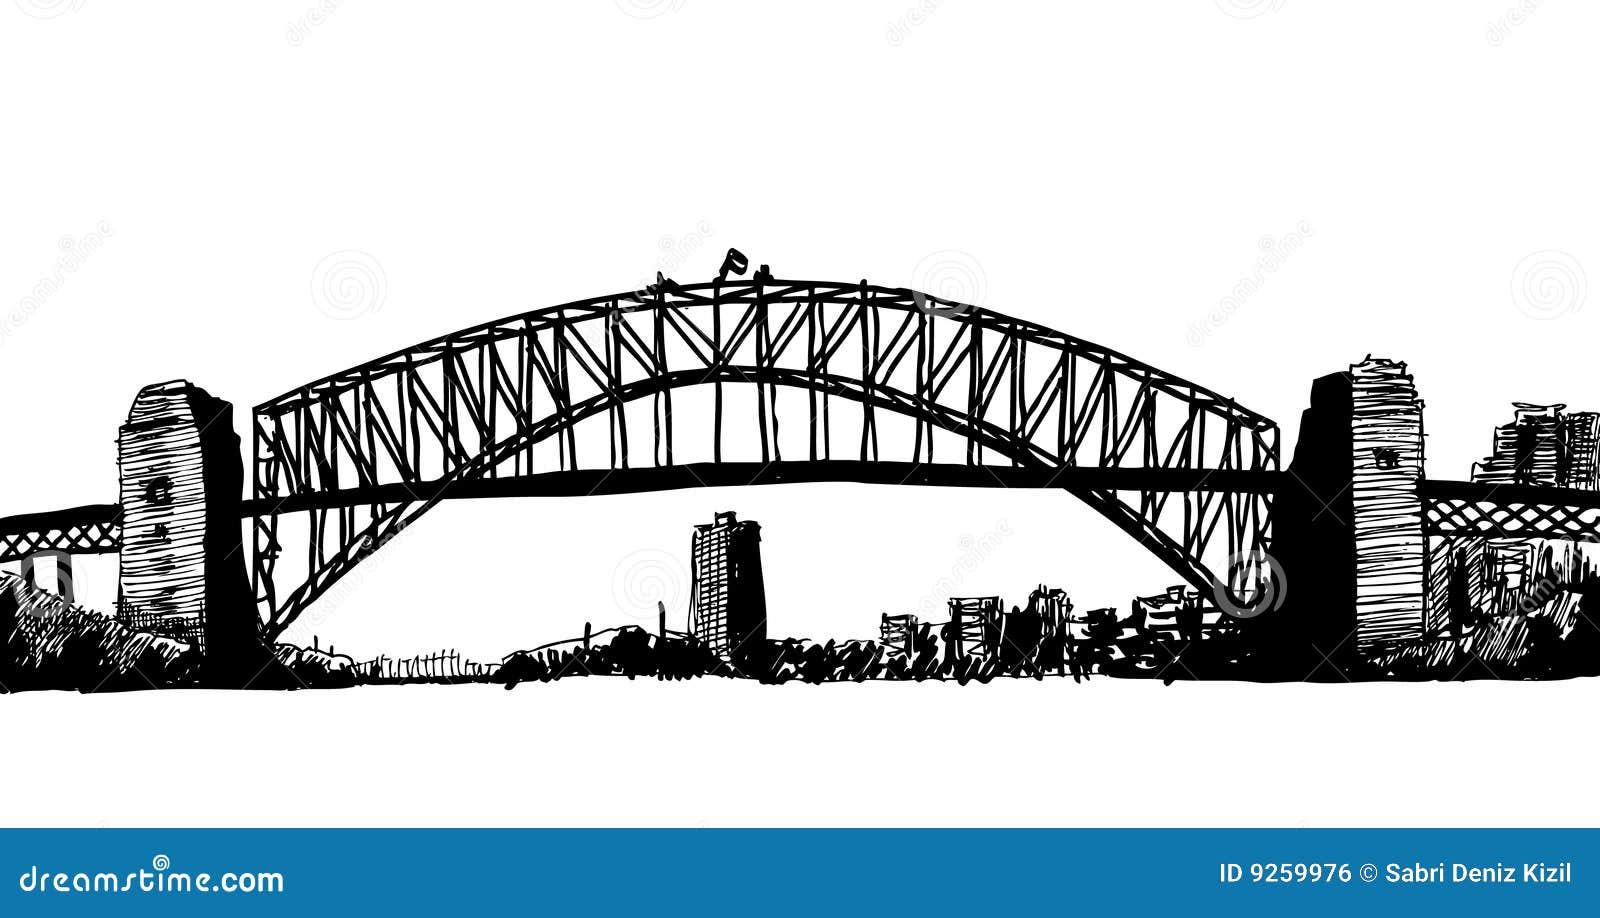 Black date online in Sydney